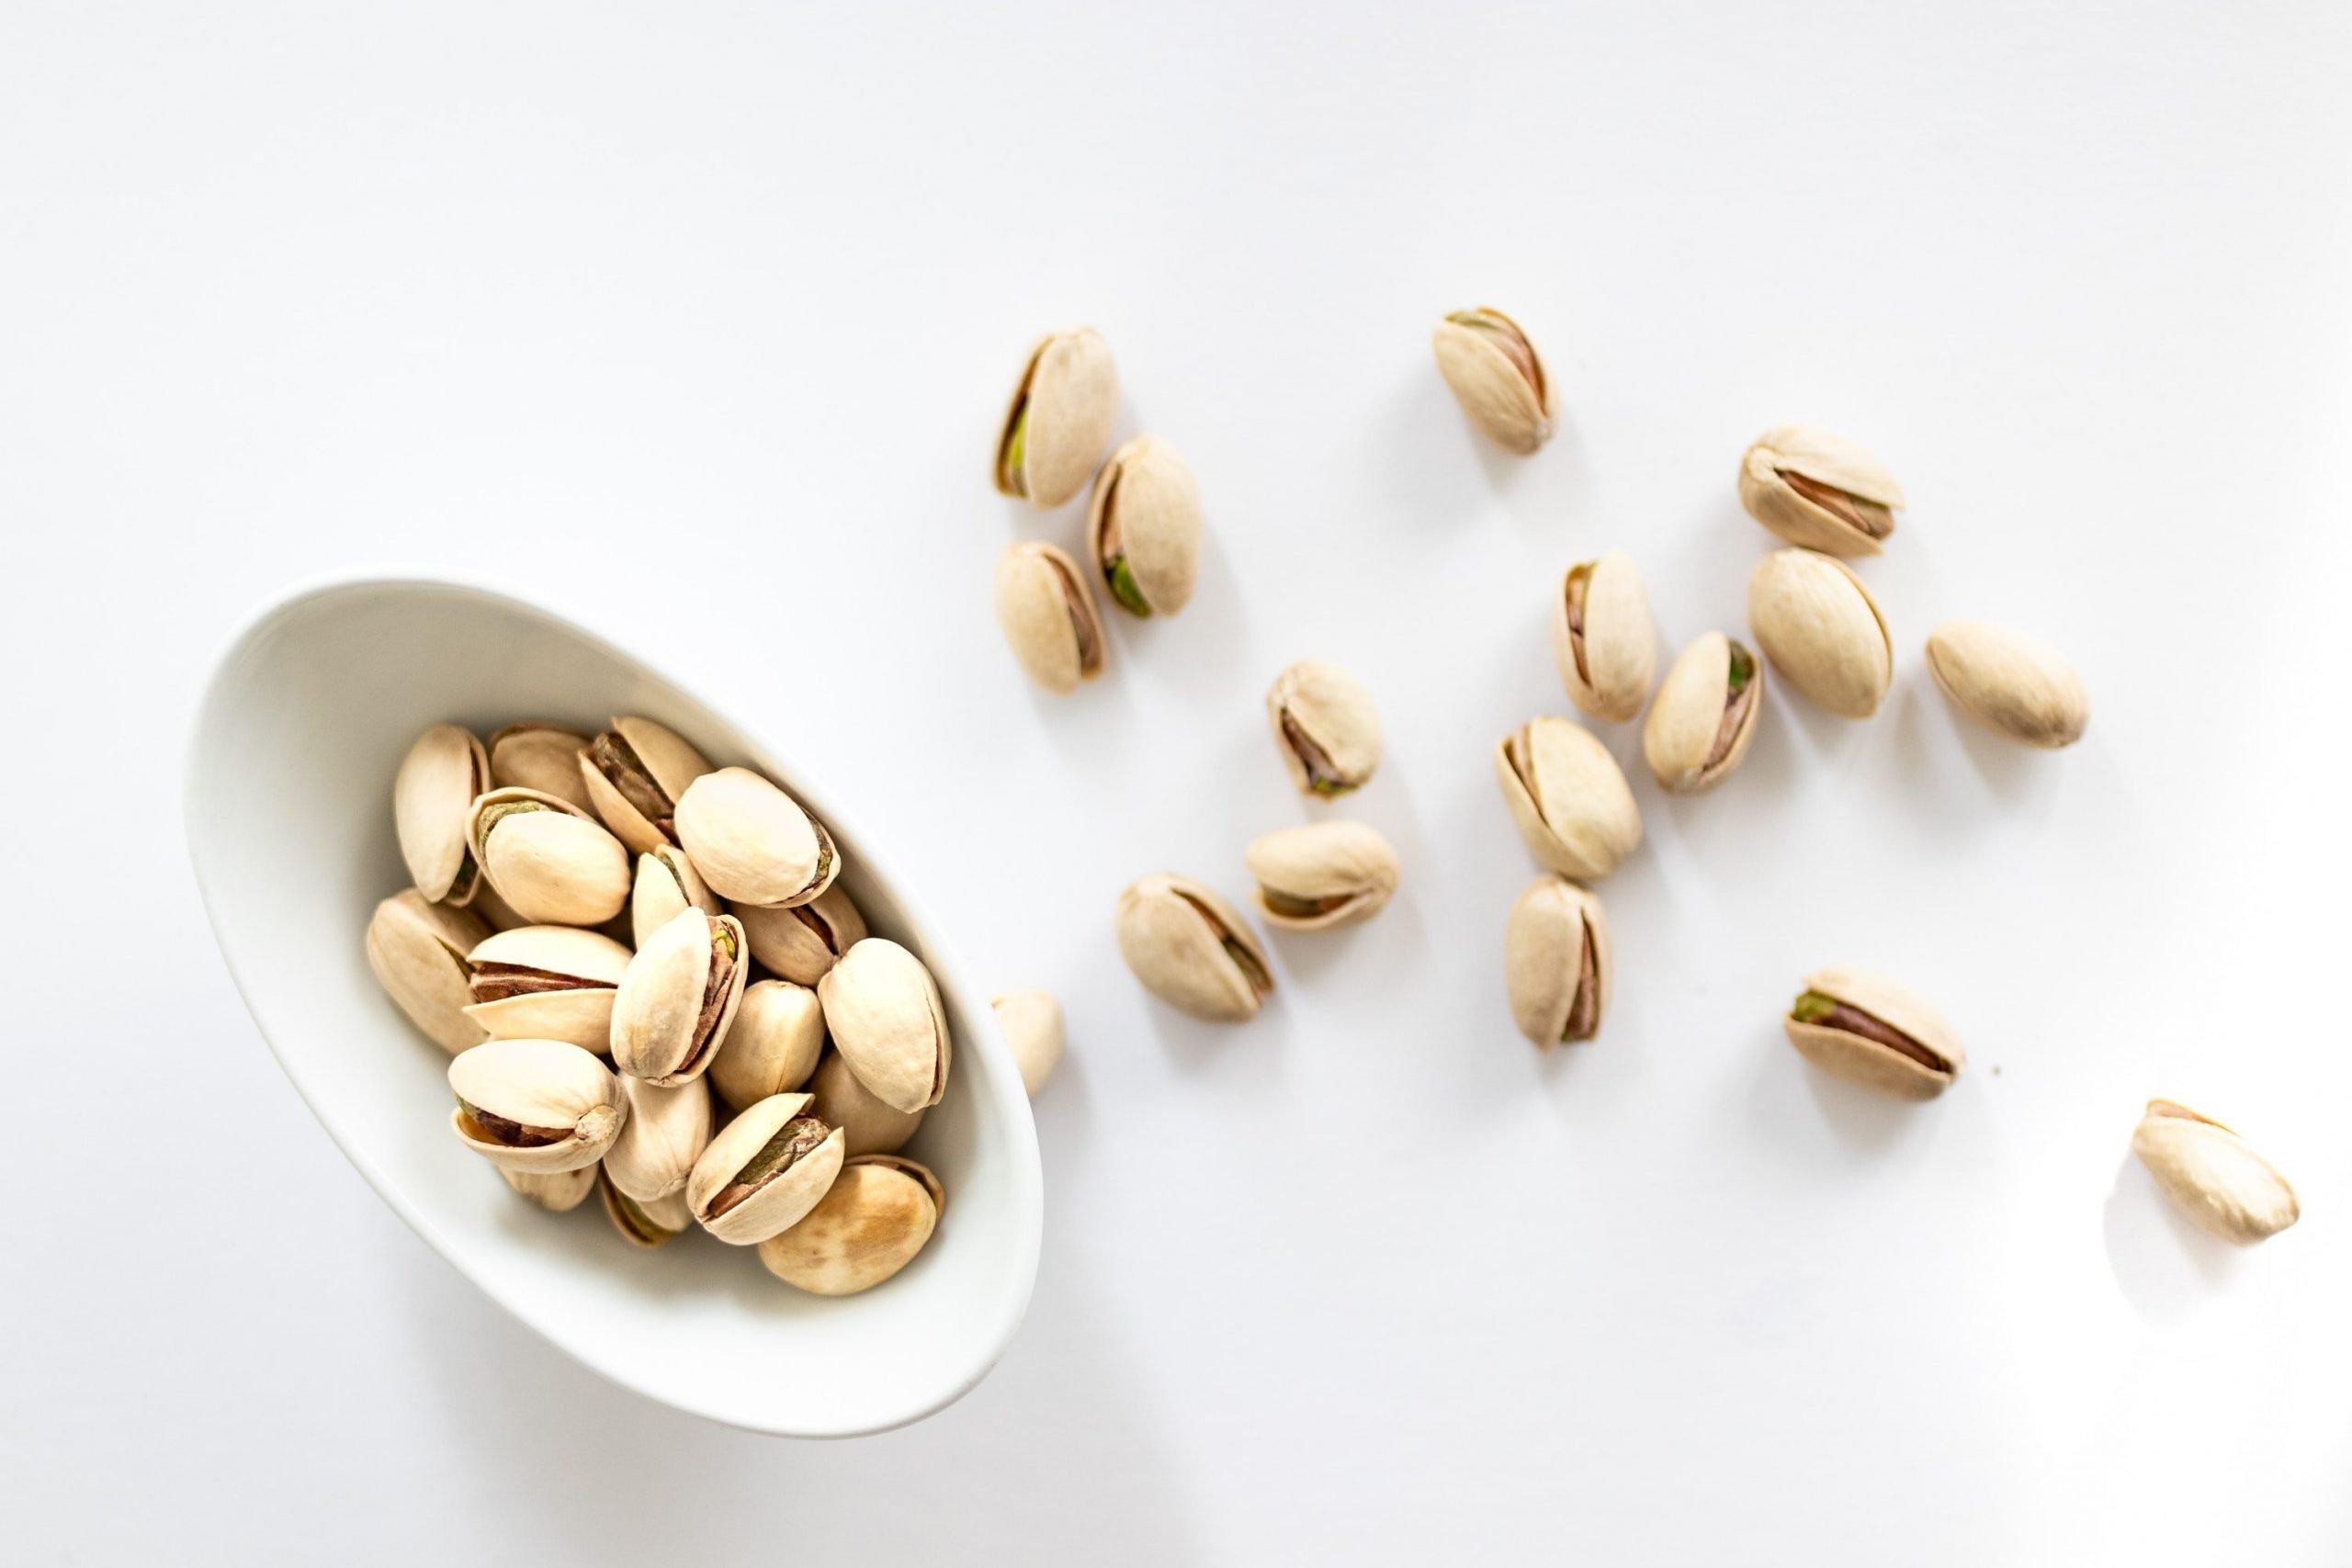 pistachios are keto friendly